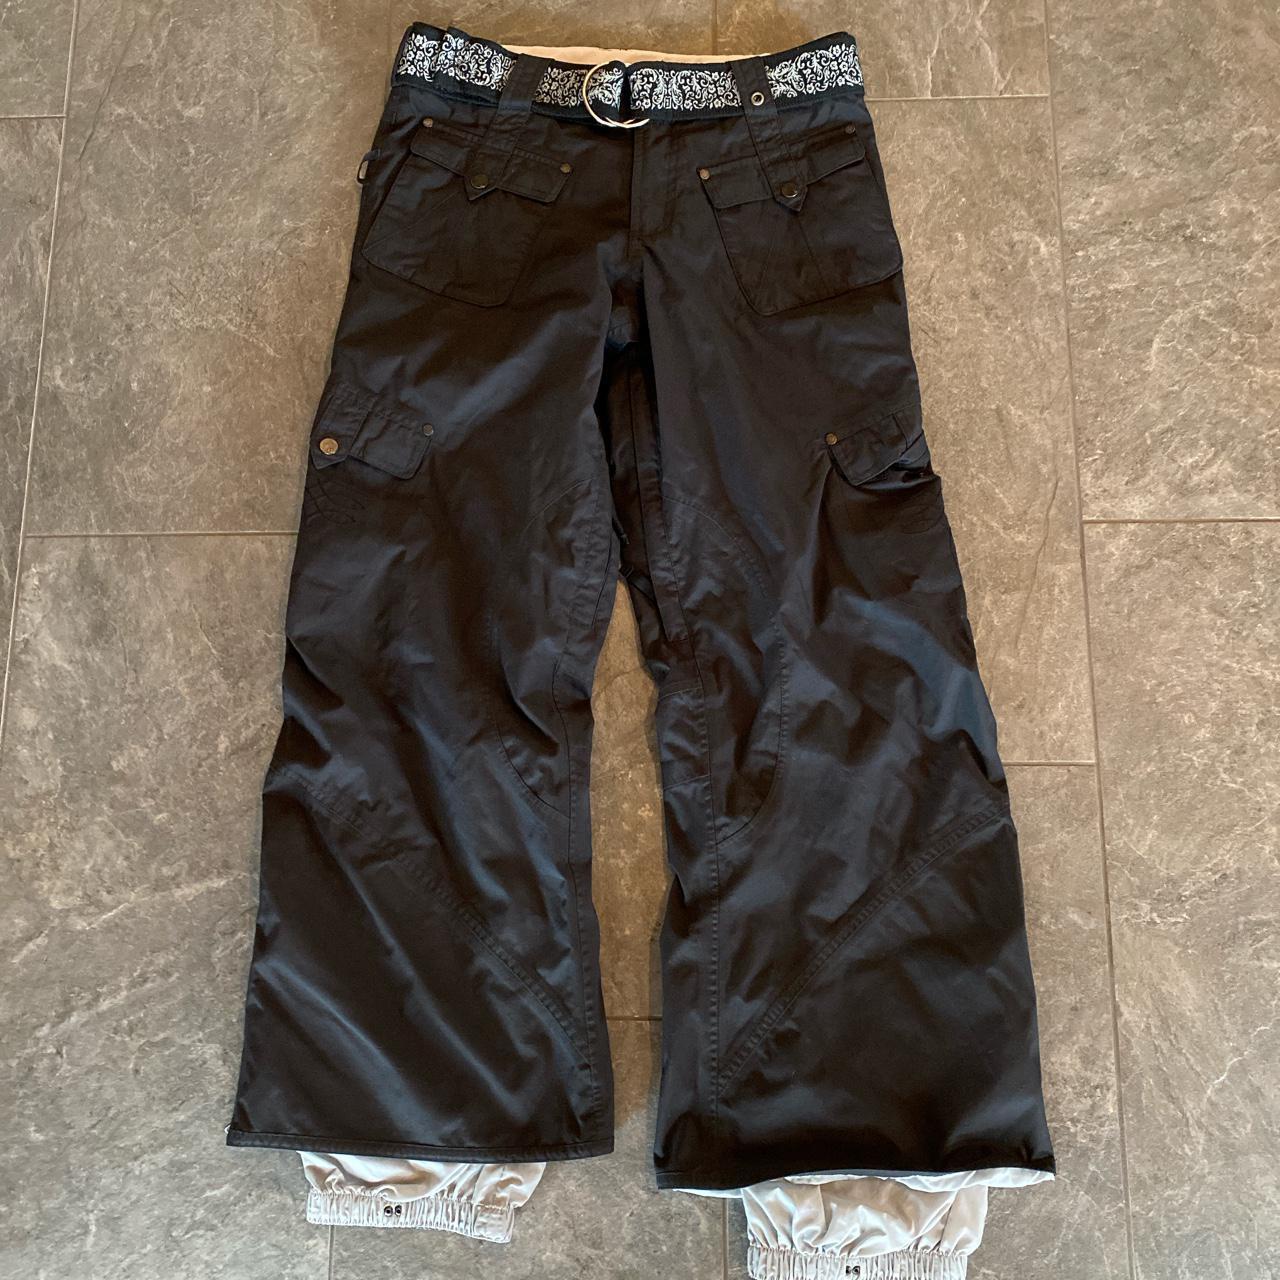 Product Image 1 - Burton Snowboard Snowboard pants in